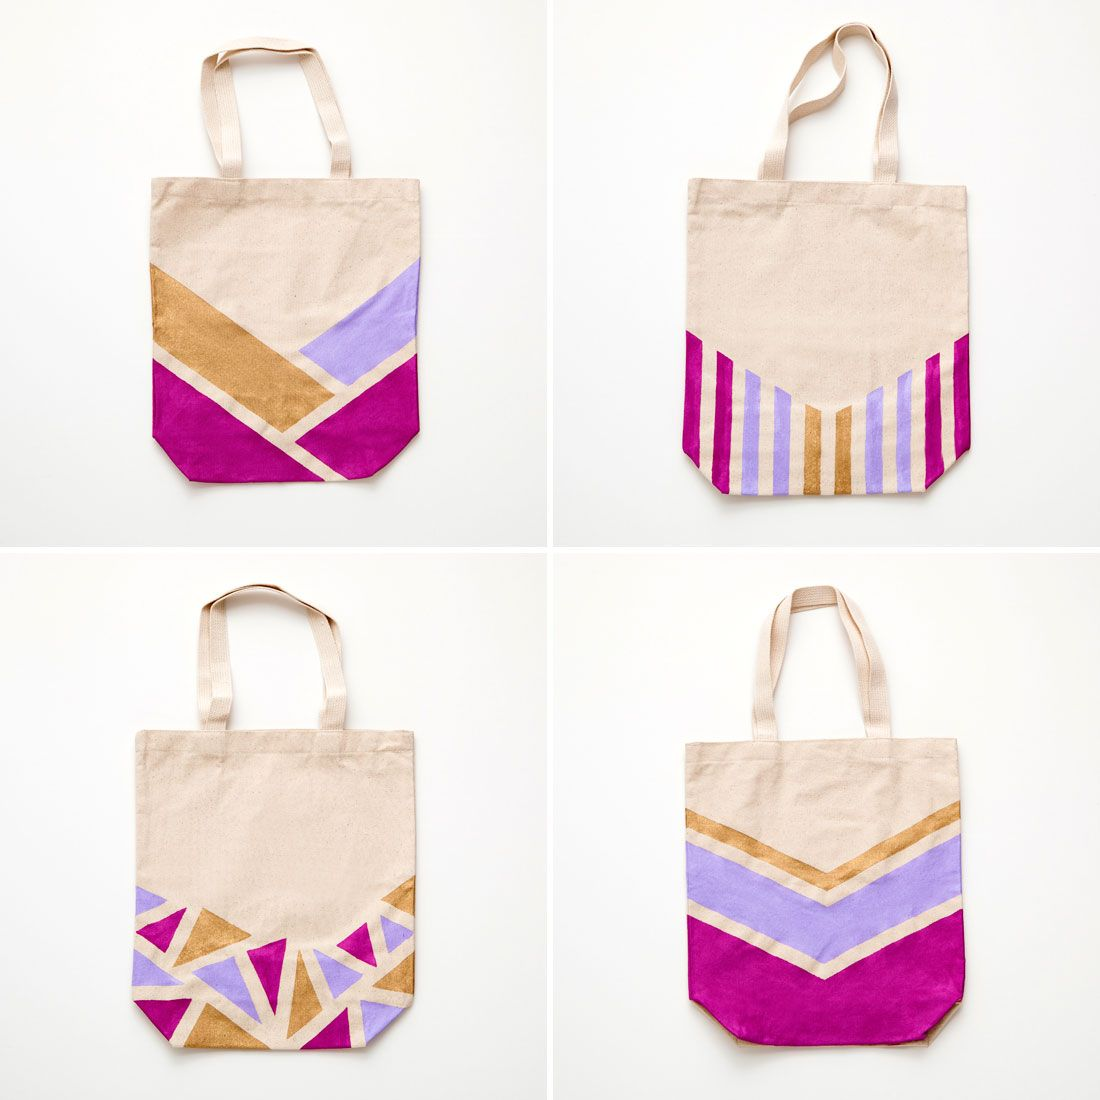 C mo hacer bolsas de tela con motivos geom tricos diy pinterest sew wallet masking tape - Como hacer manualidades con tela ...